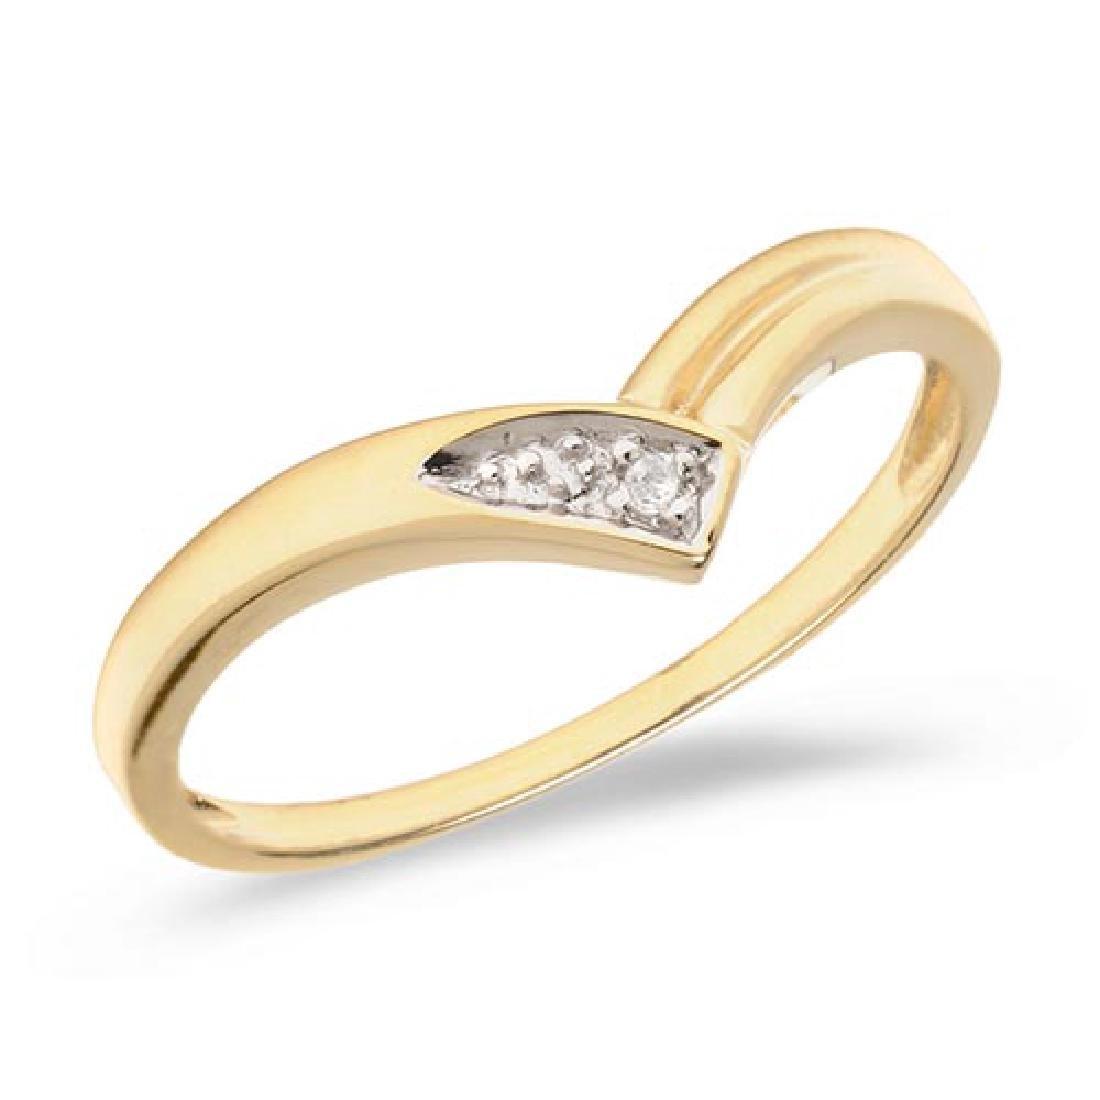 Certified 14K Yellow Gold Diamond Chevron Ring 0.01 CTW